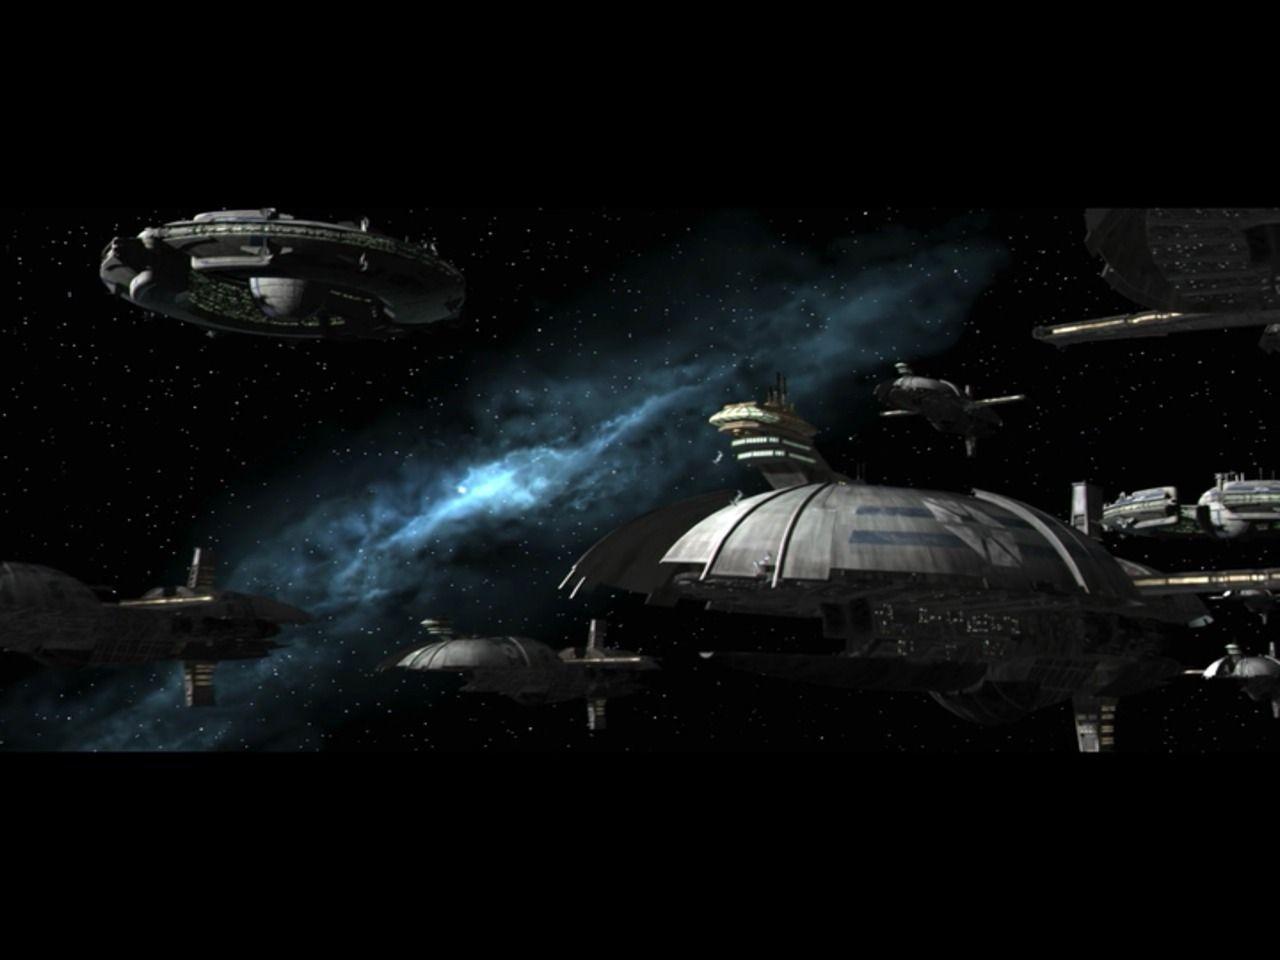 Star Wars Separatist Vehicles Wallpapers Wallpaper Cave